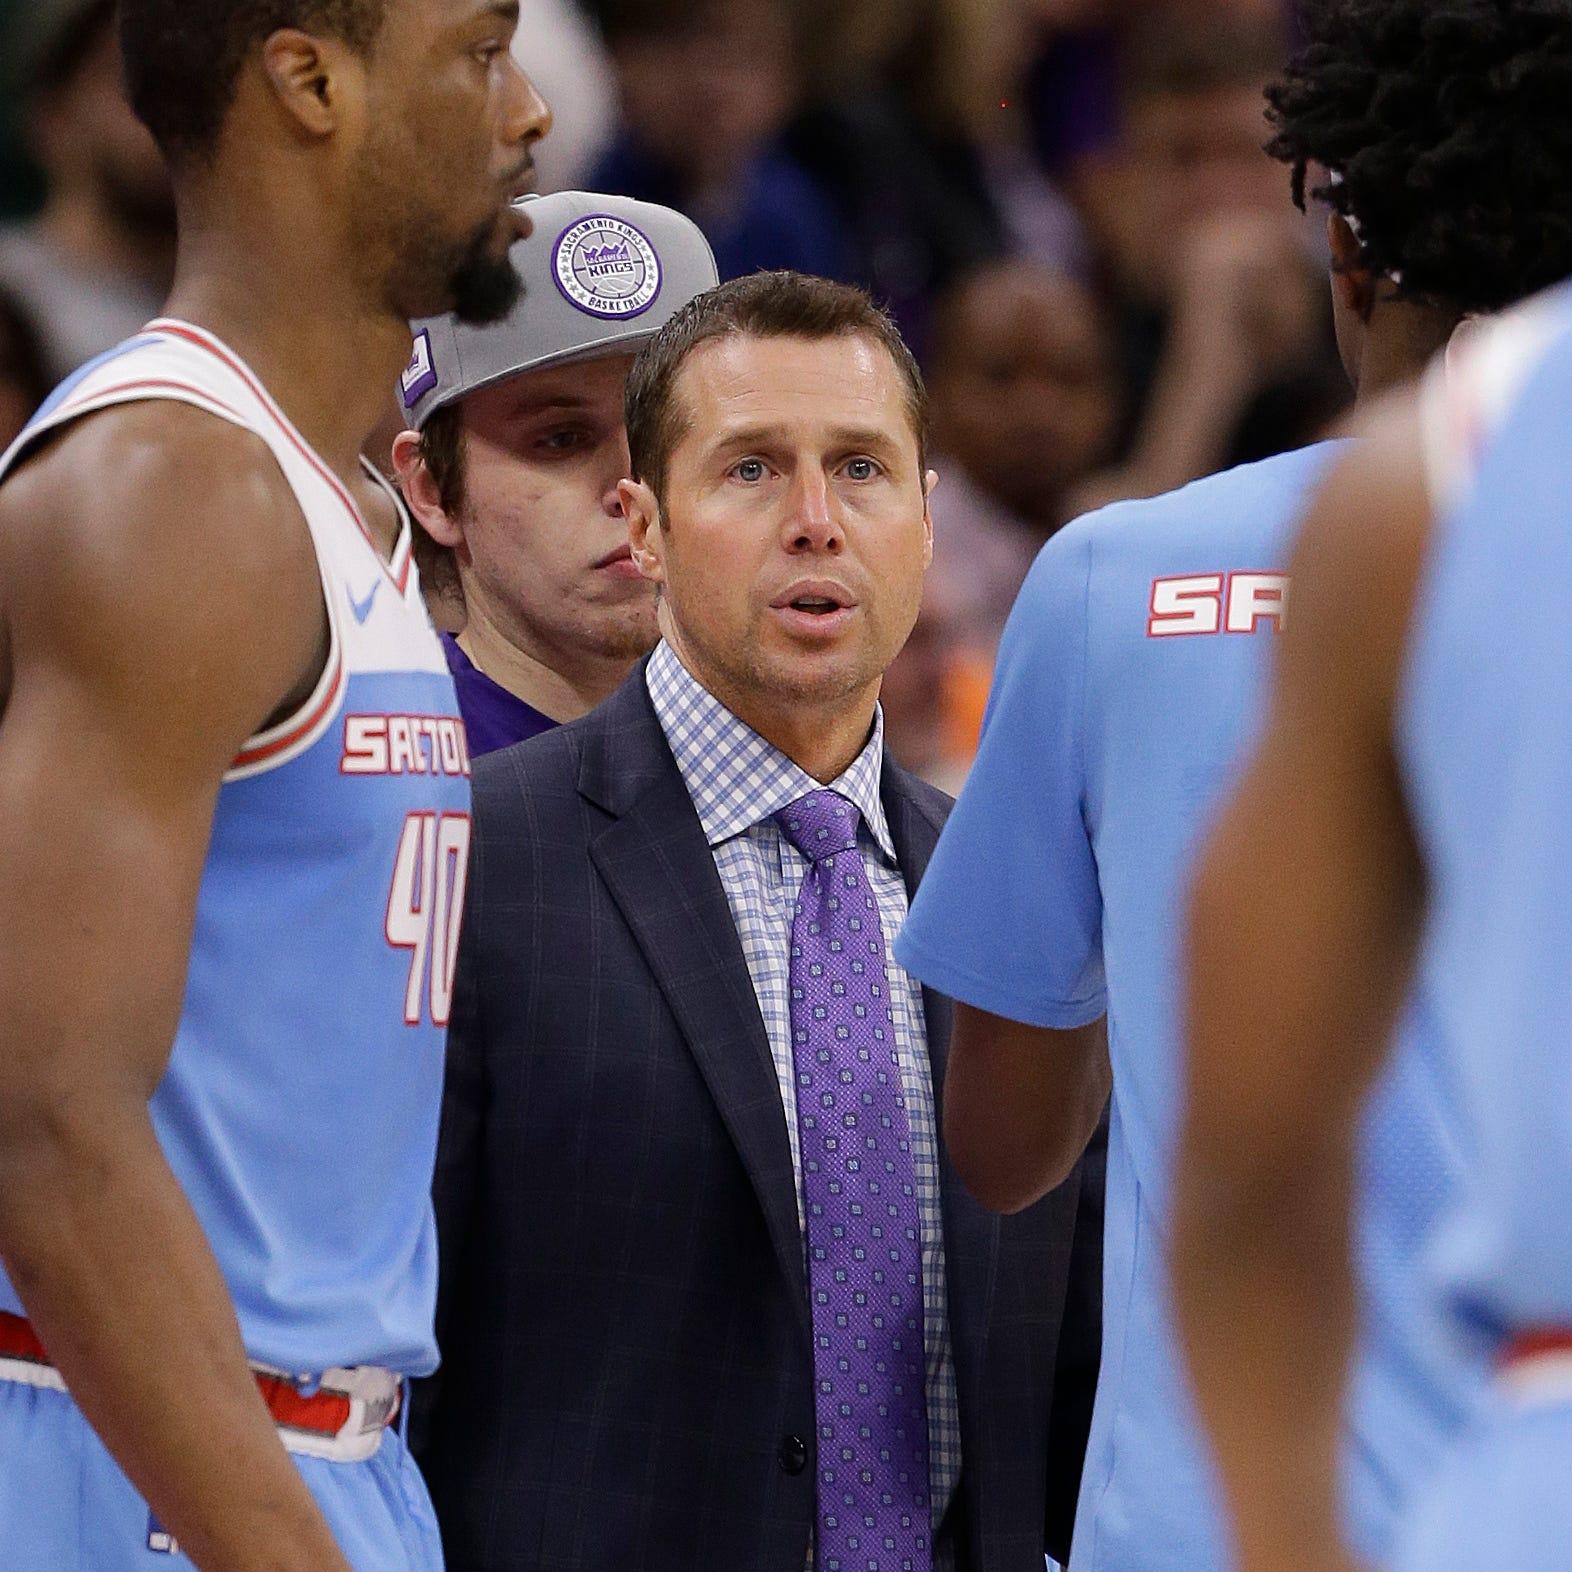 Candidates for the Phoenix Suns' head coaching job